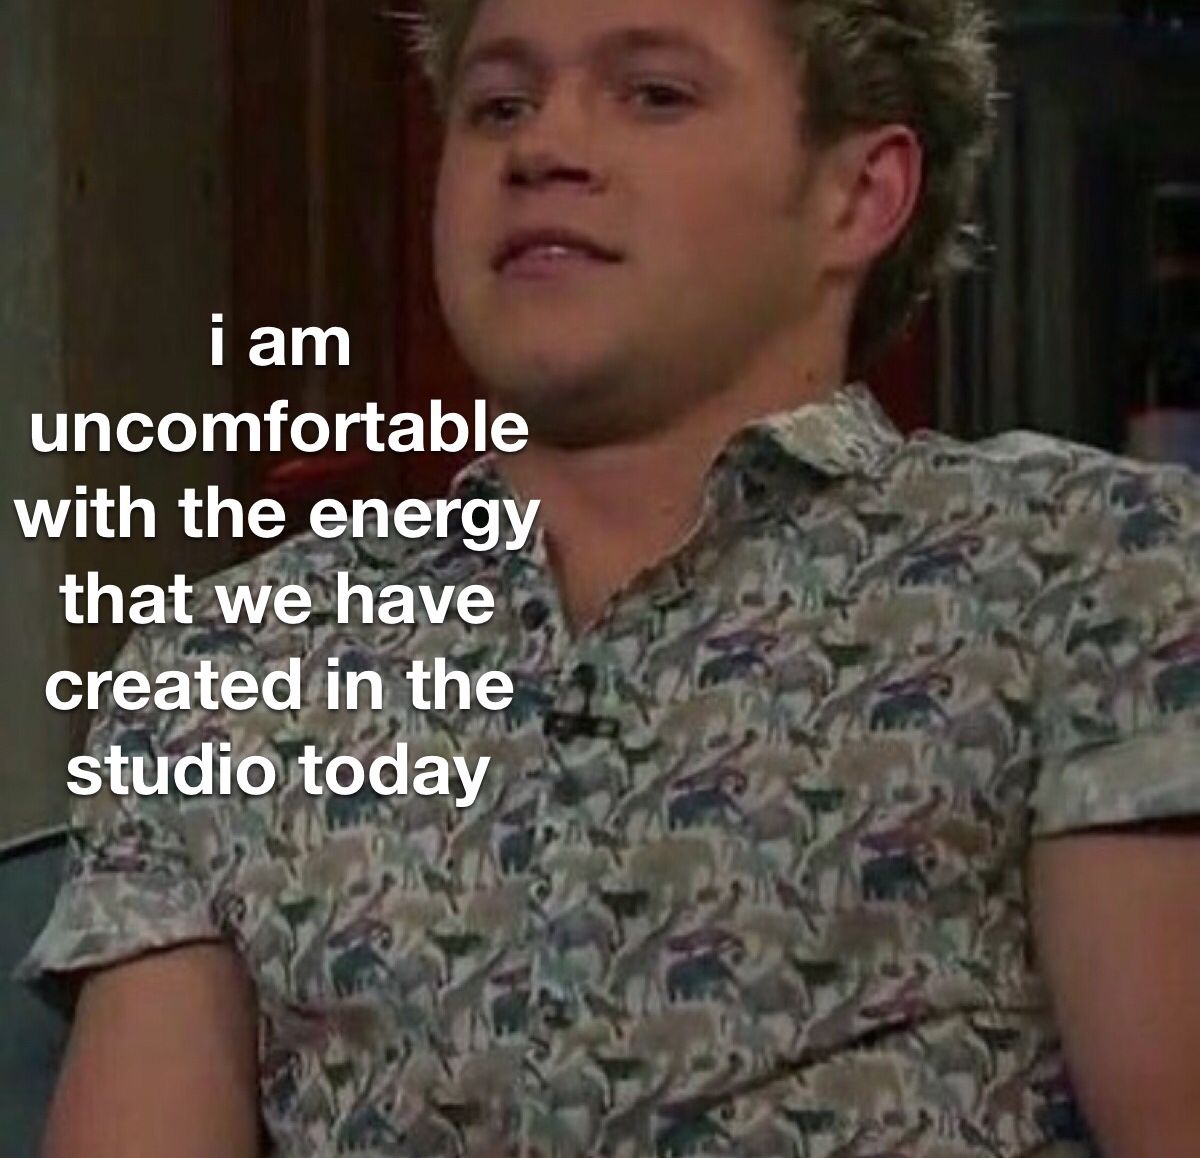 R A D D E S T E L L I E In 2020 One Direction Humor One Direction Videos One Direction Memes